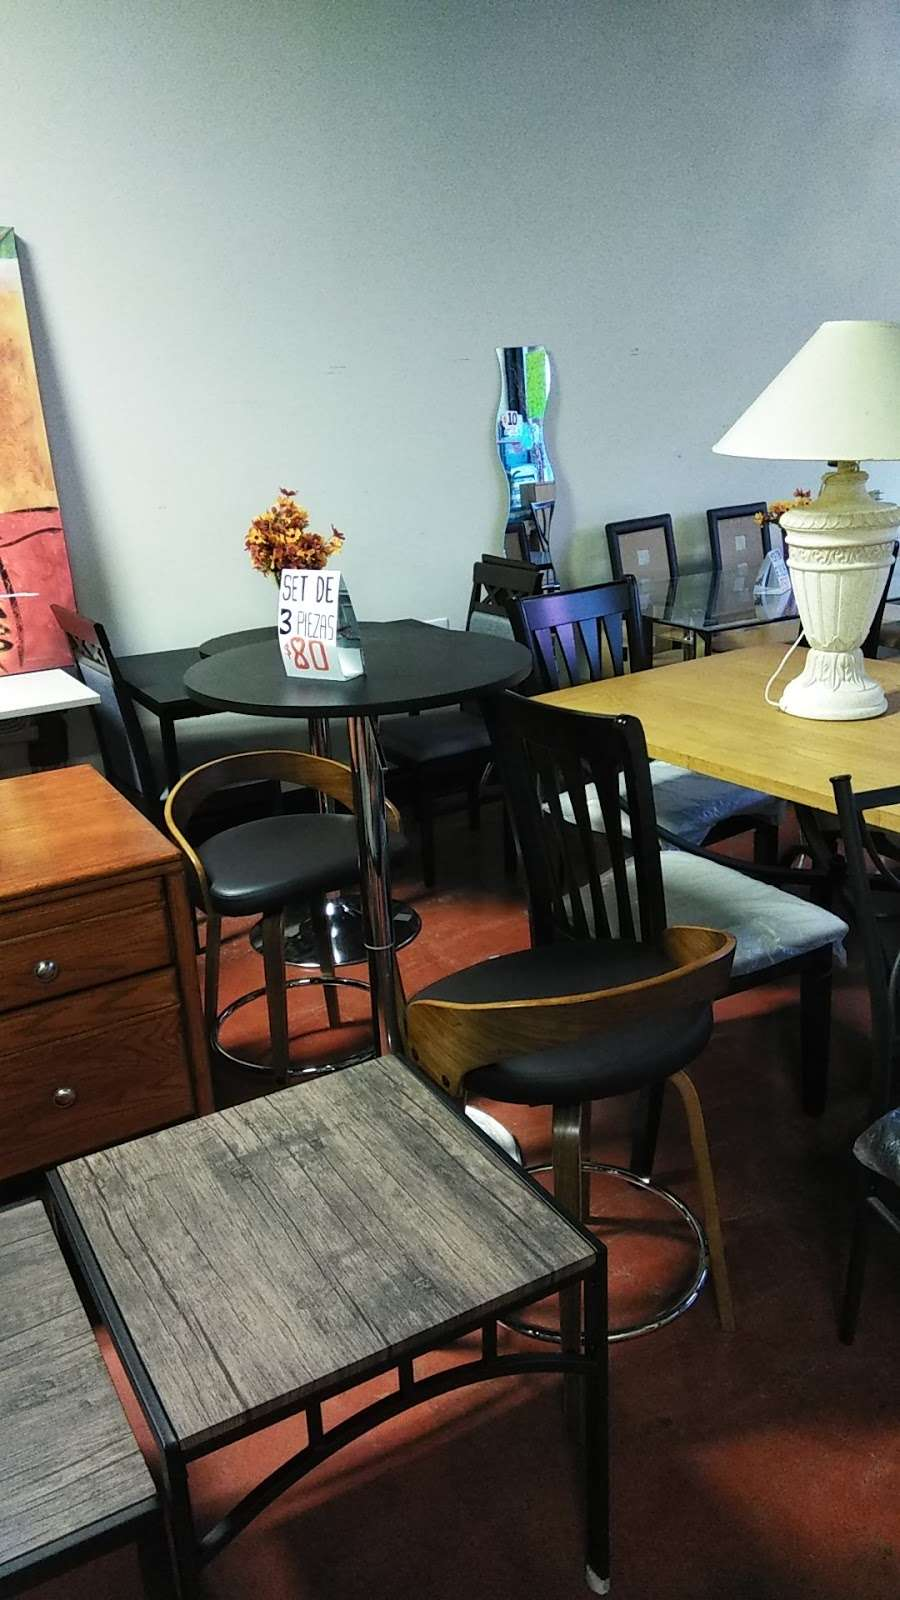 Rositas furniture - furniture store  | Photo 10 of 10 | Address: 5046 W Fullerton Ave, Chicago, IL 60639, USA | Phone: (773) 276-9250